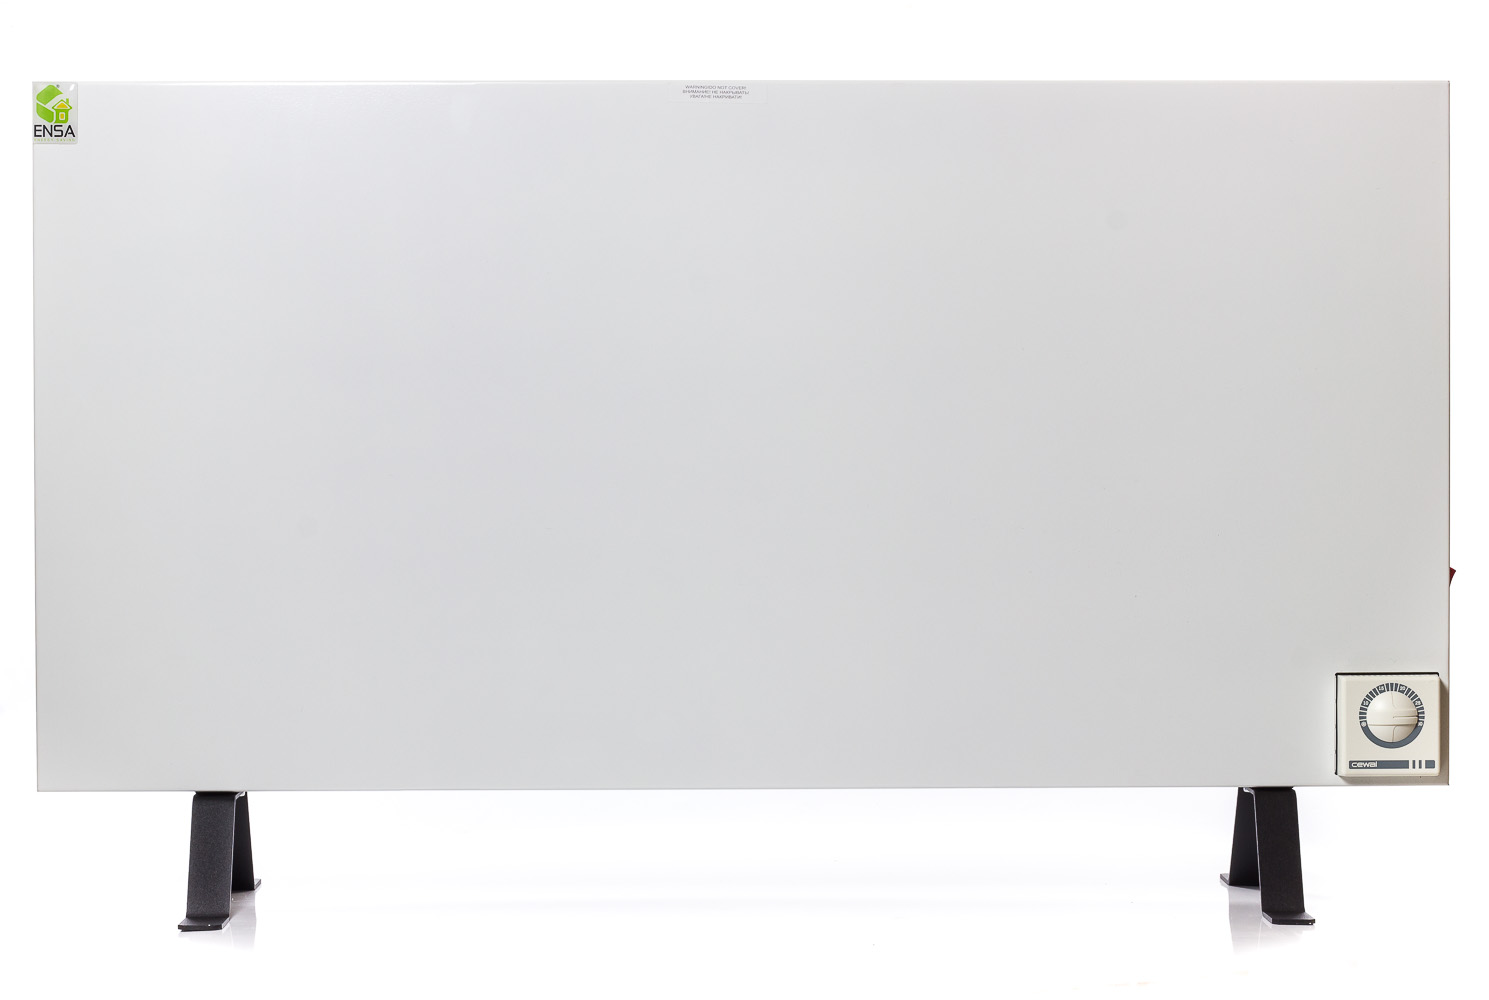 ENSA-C750